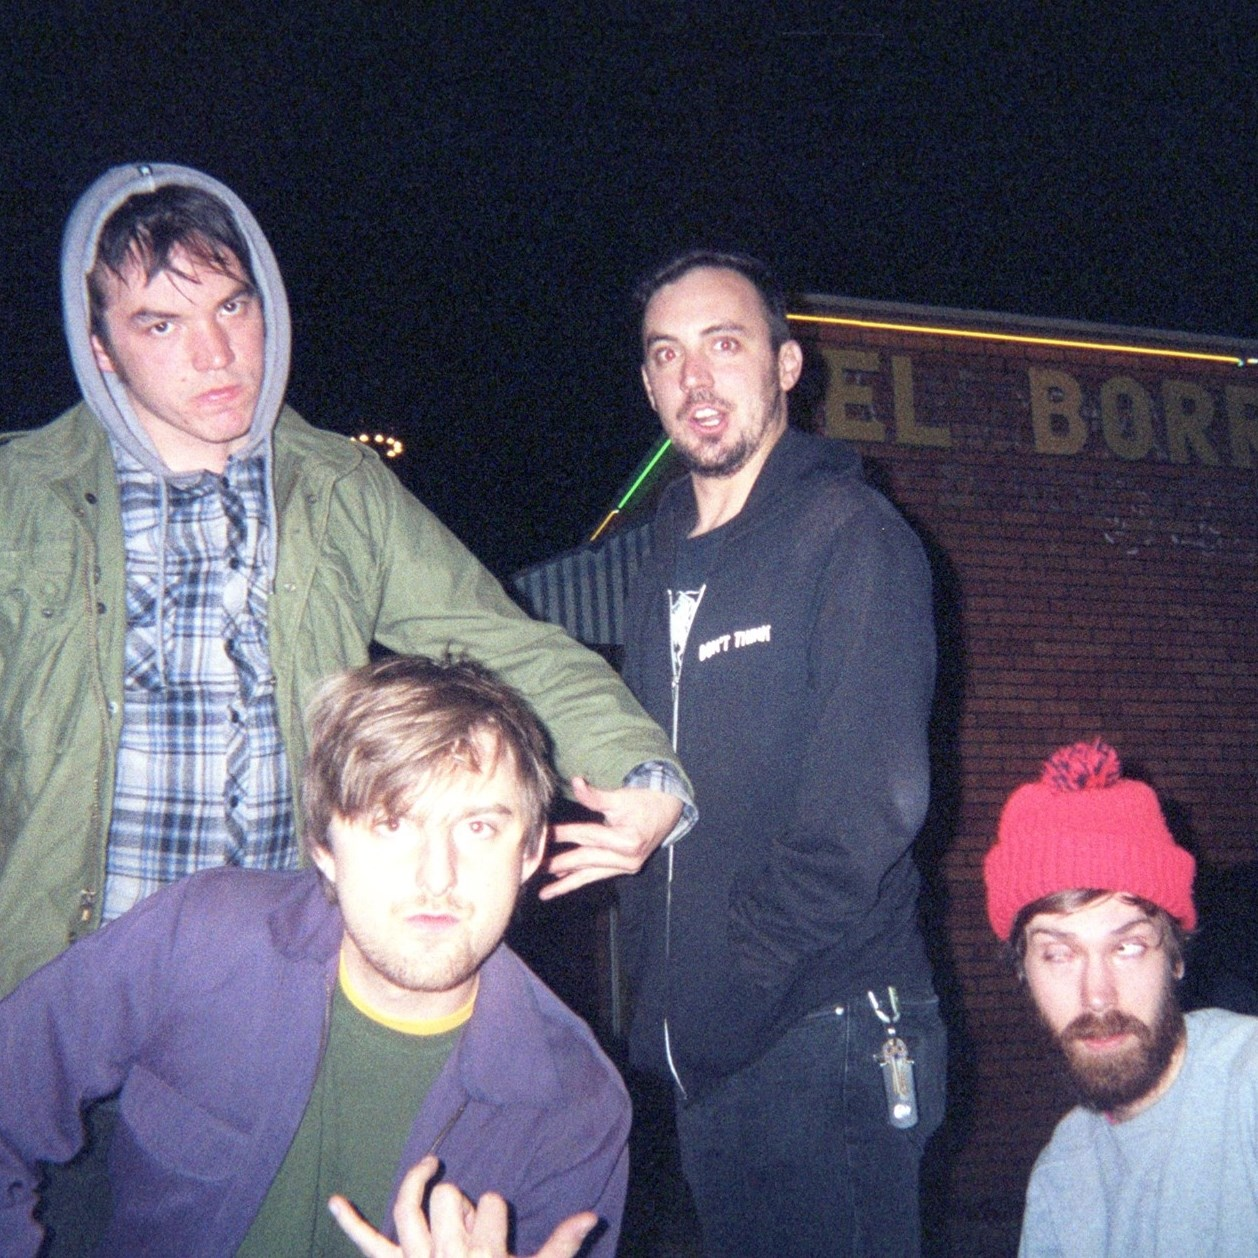 Austin Punk Scene Takes an Eccentric Turn with Cowpunk Quartet Leche - The Cosmic Clash